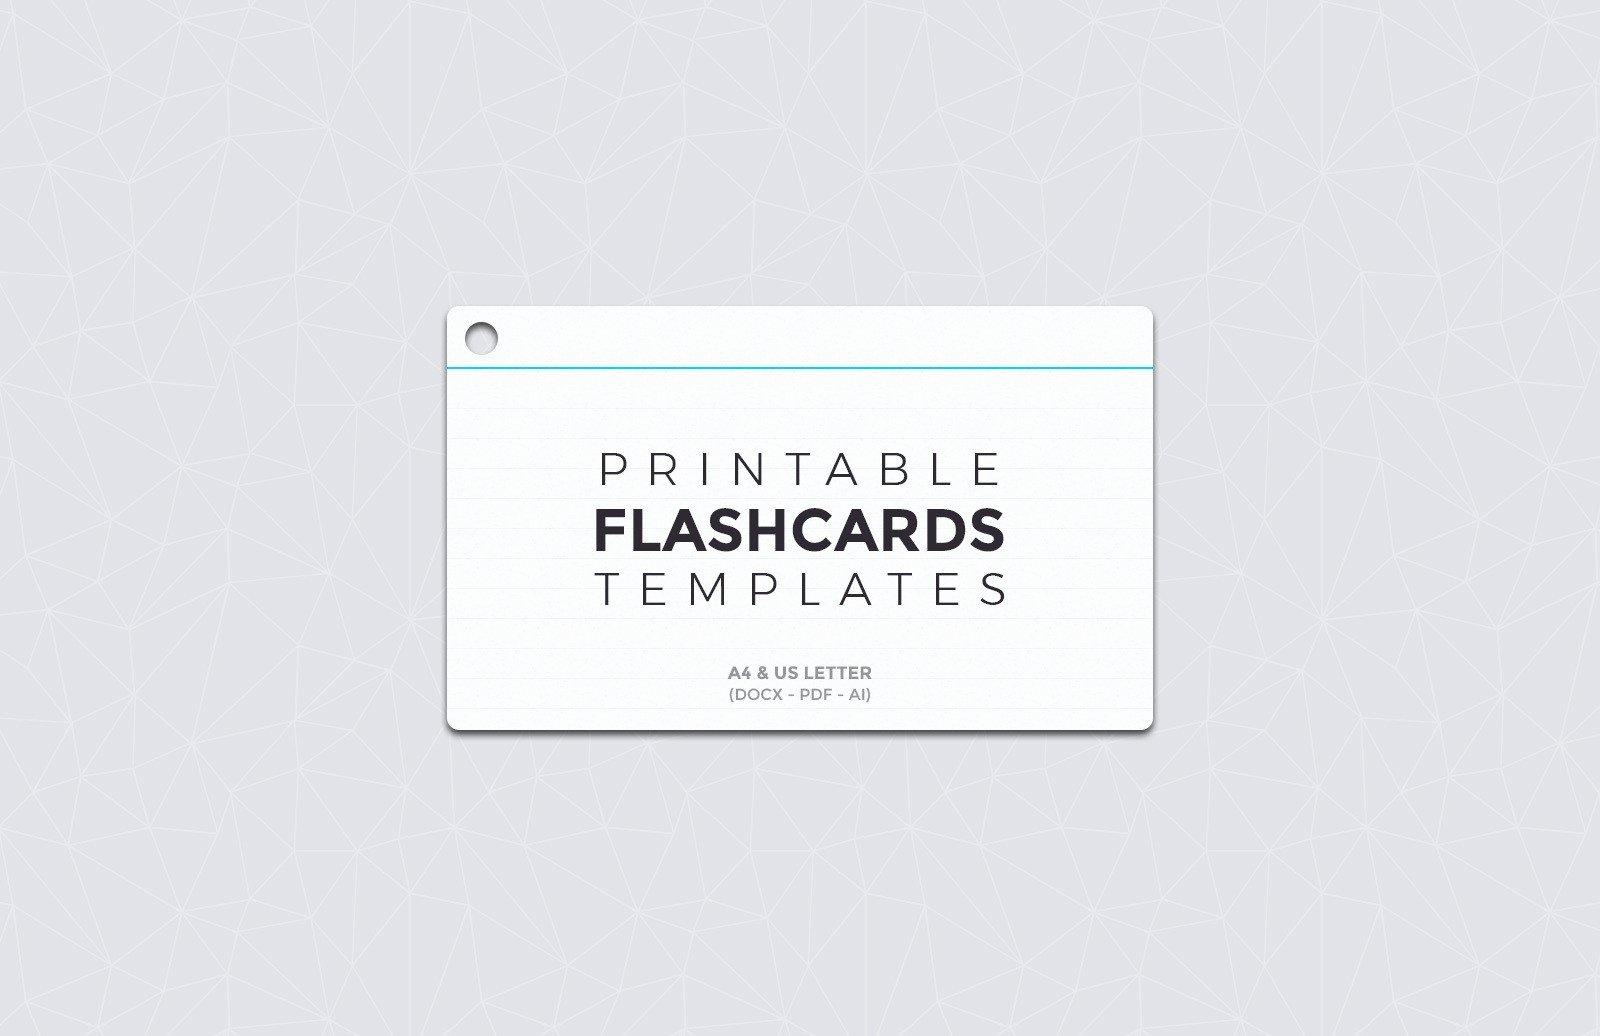 Free Printable Flash Card Templates Fresh Free Printable Flashcard Templates — Medialoot